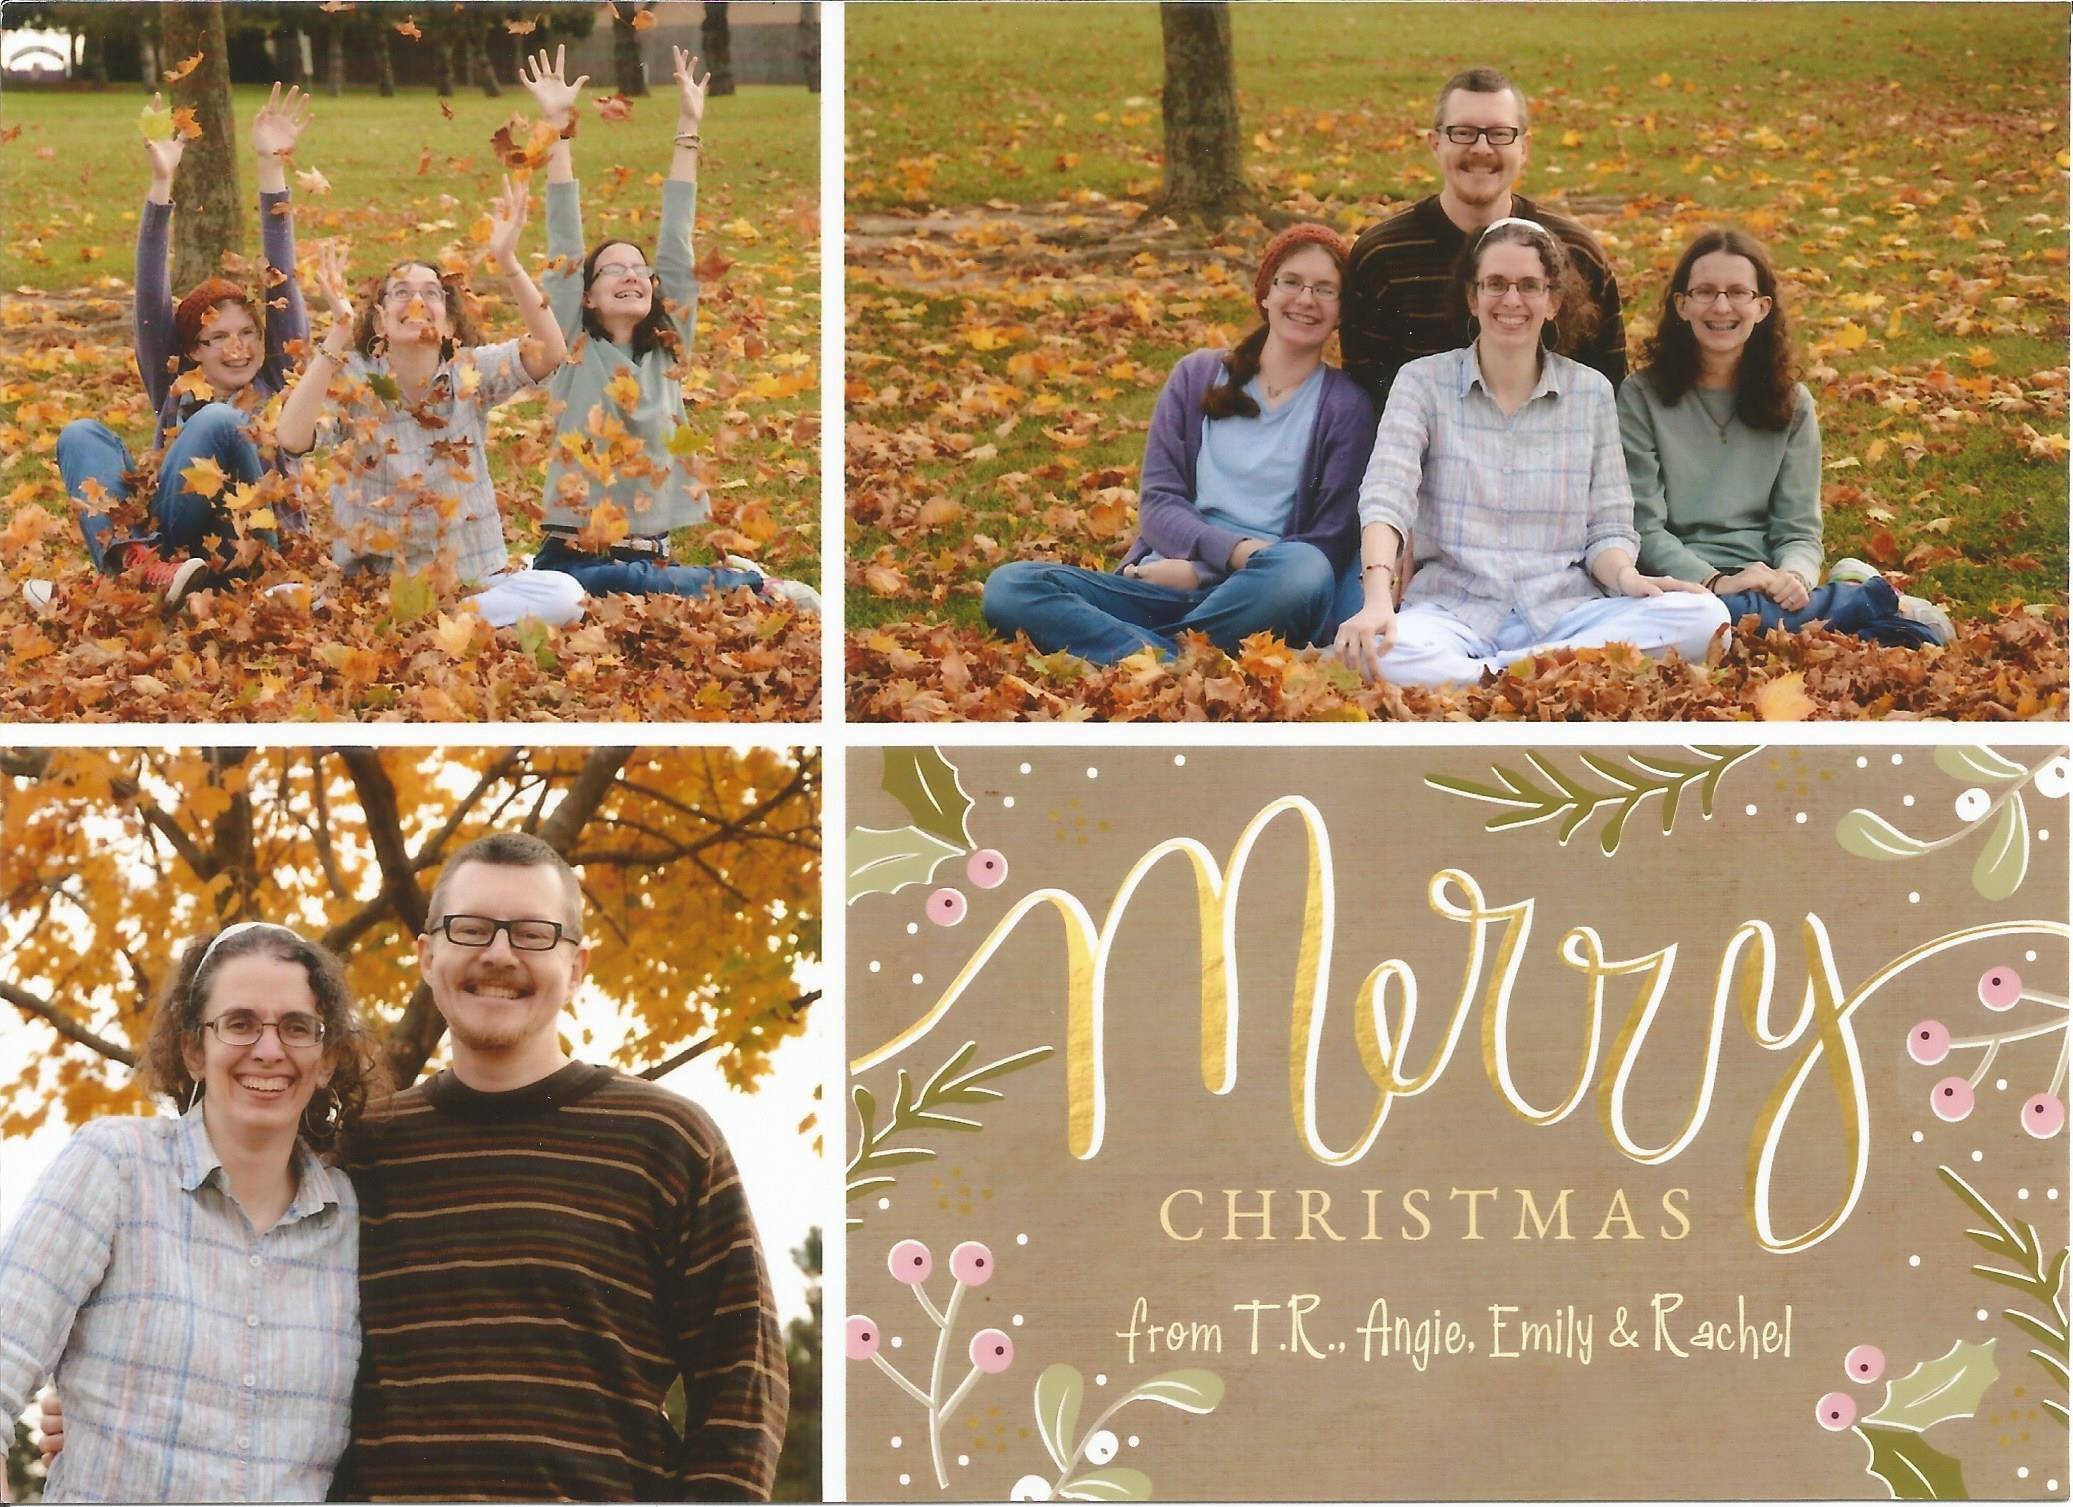 Knight Christmas Photo 2014